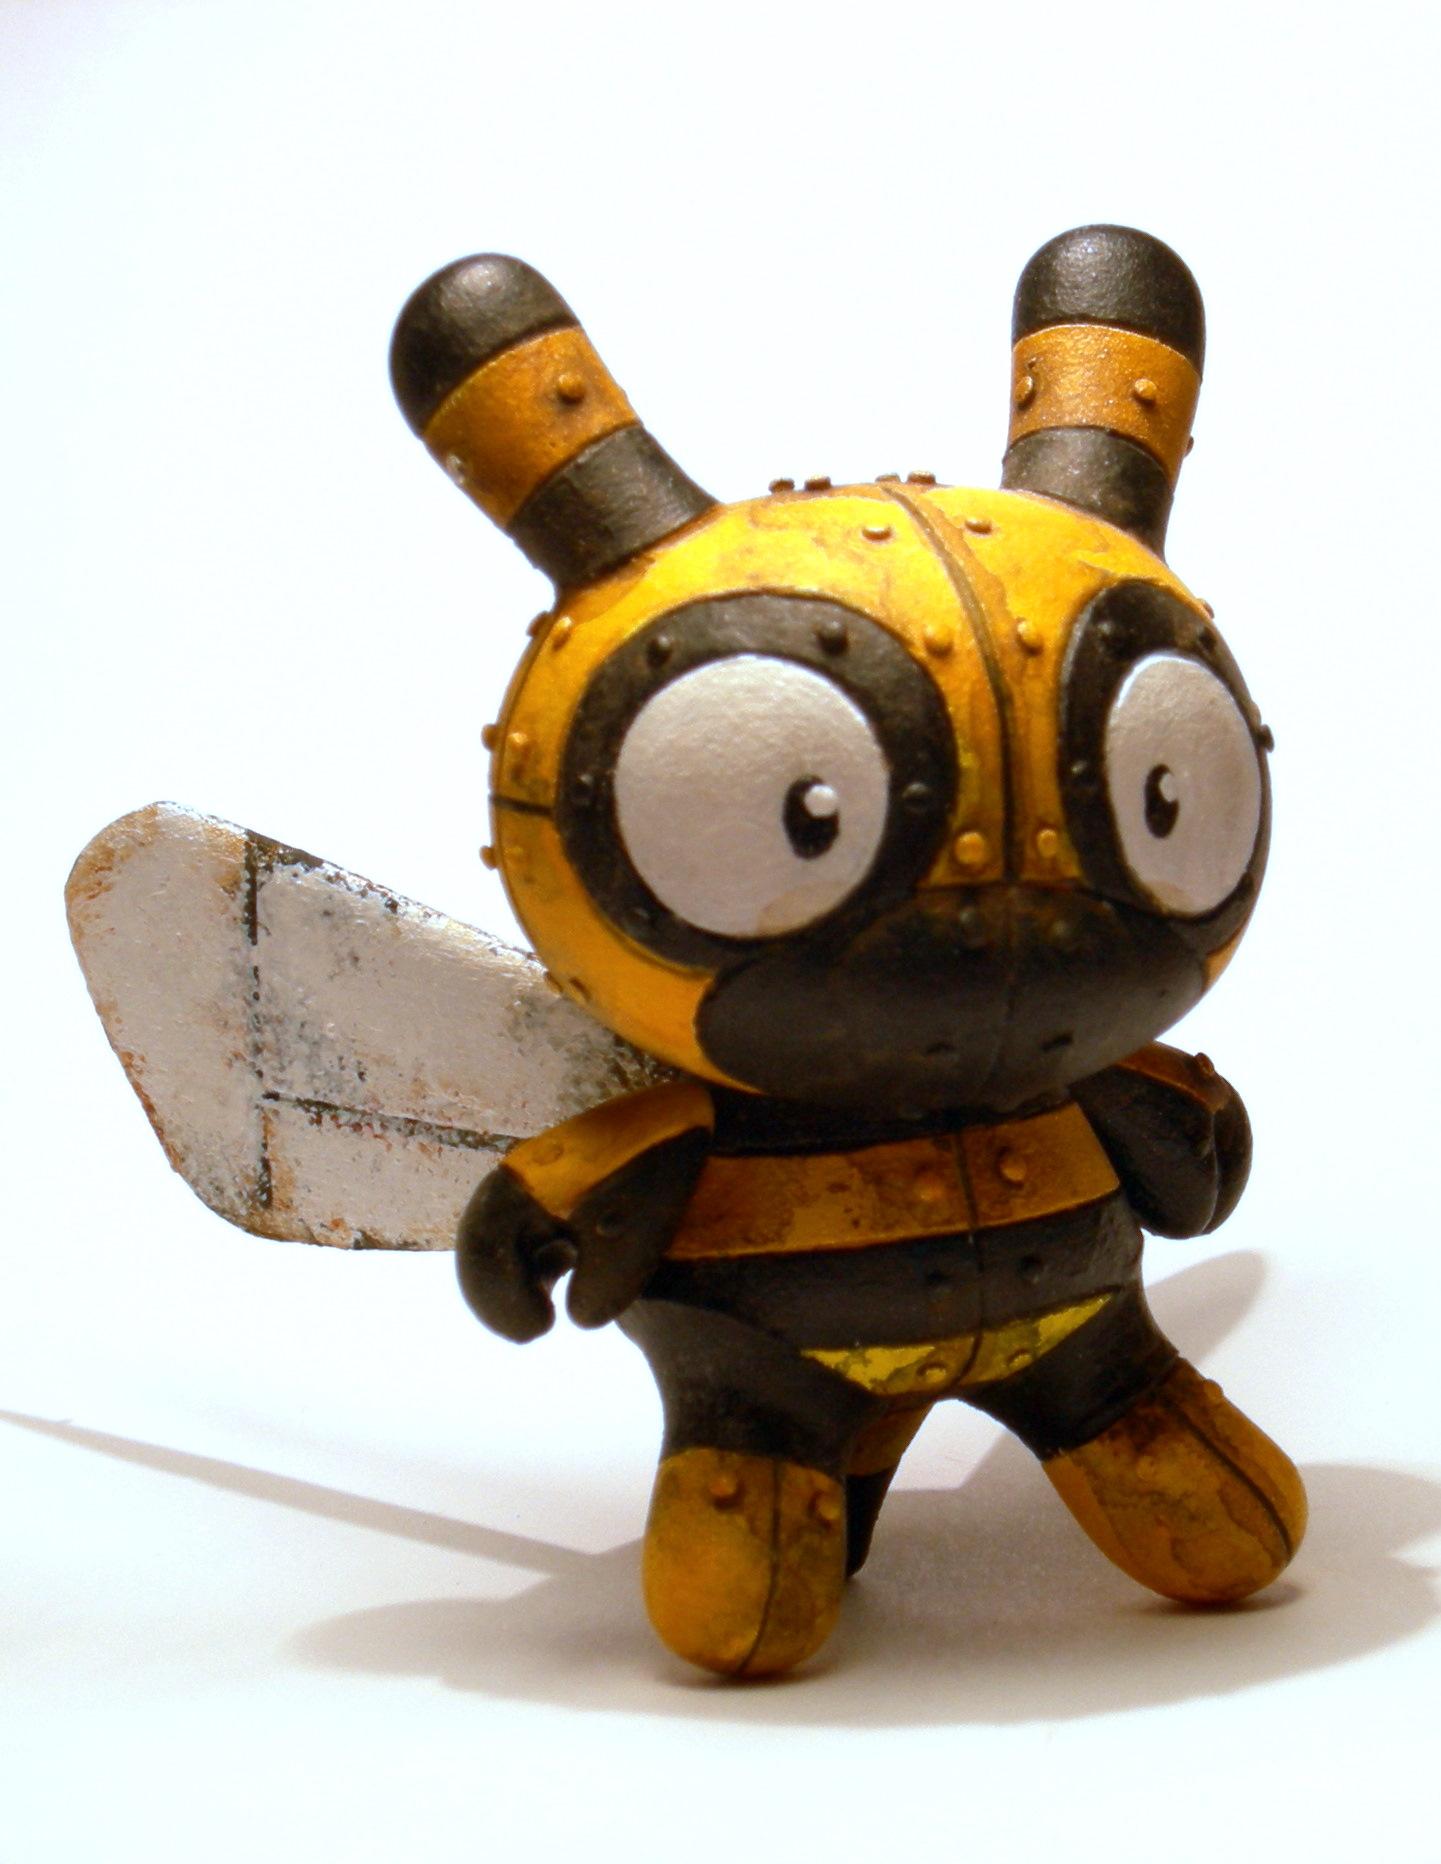 The original Iron Bee